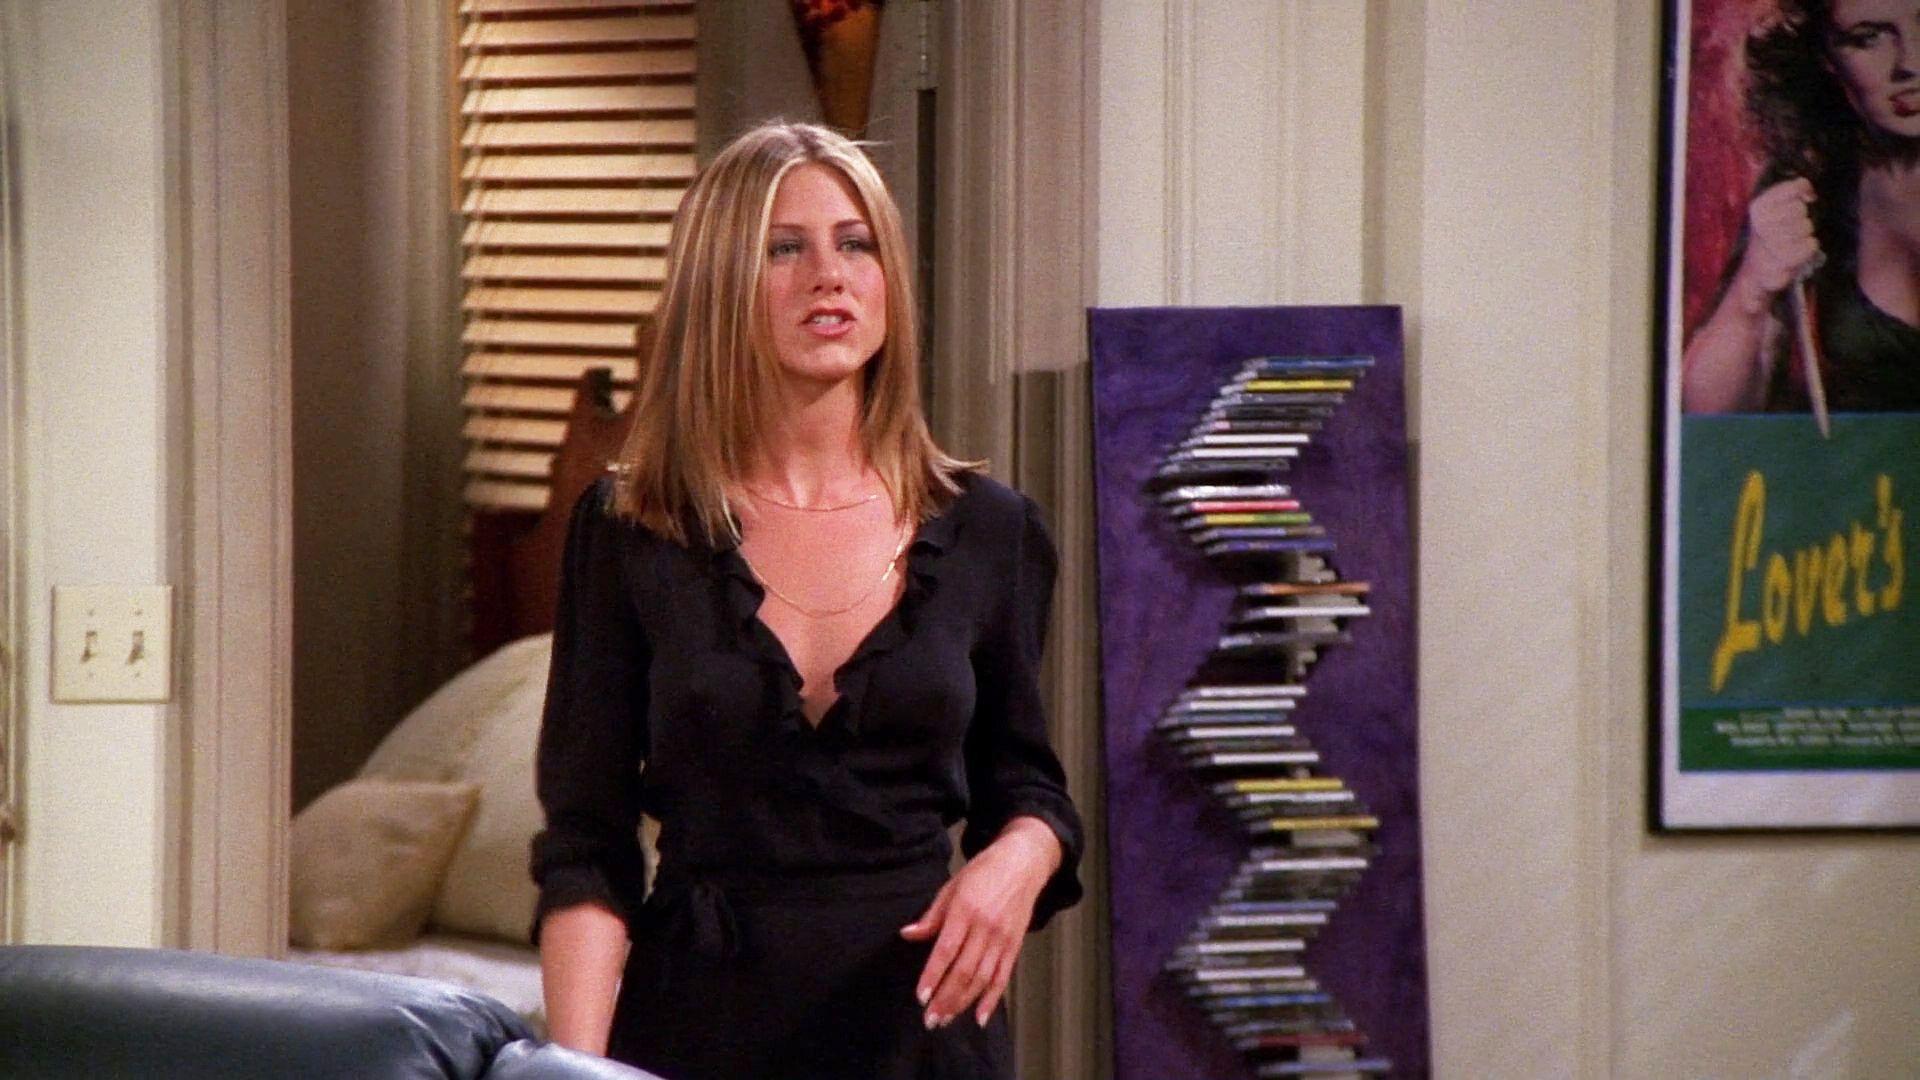 Season 8 Rachel S Date Rachel Green Outfits Rachel Green Style Fashion [ 1080 x 1920 Pixel ]